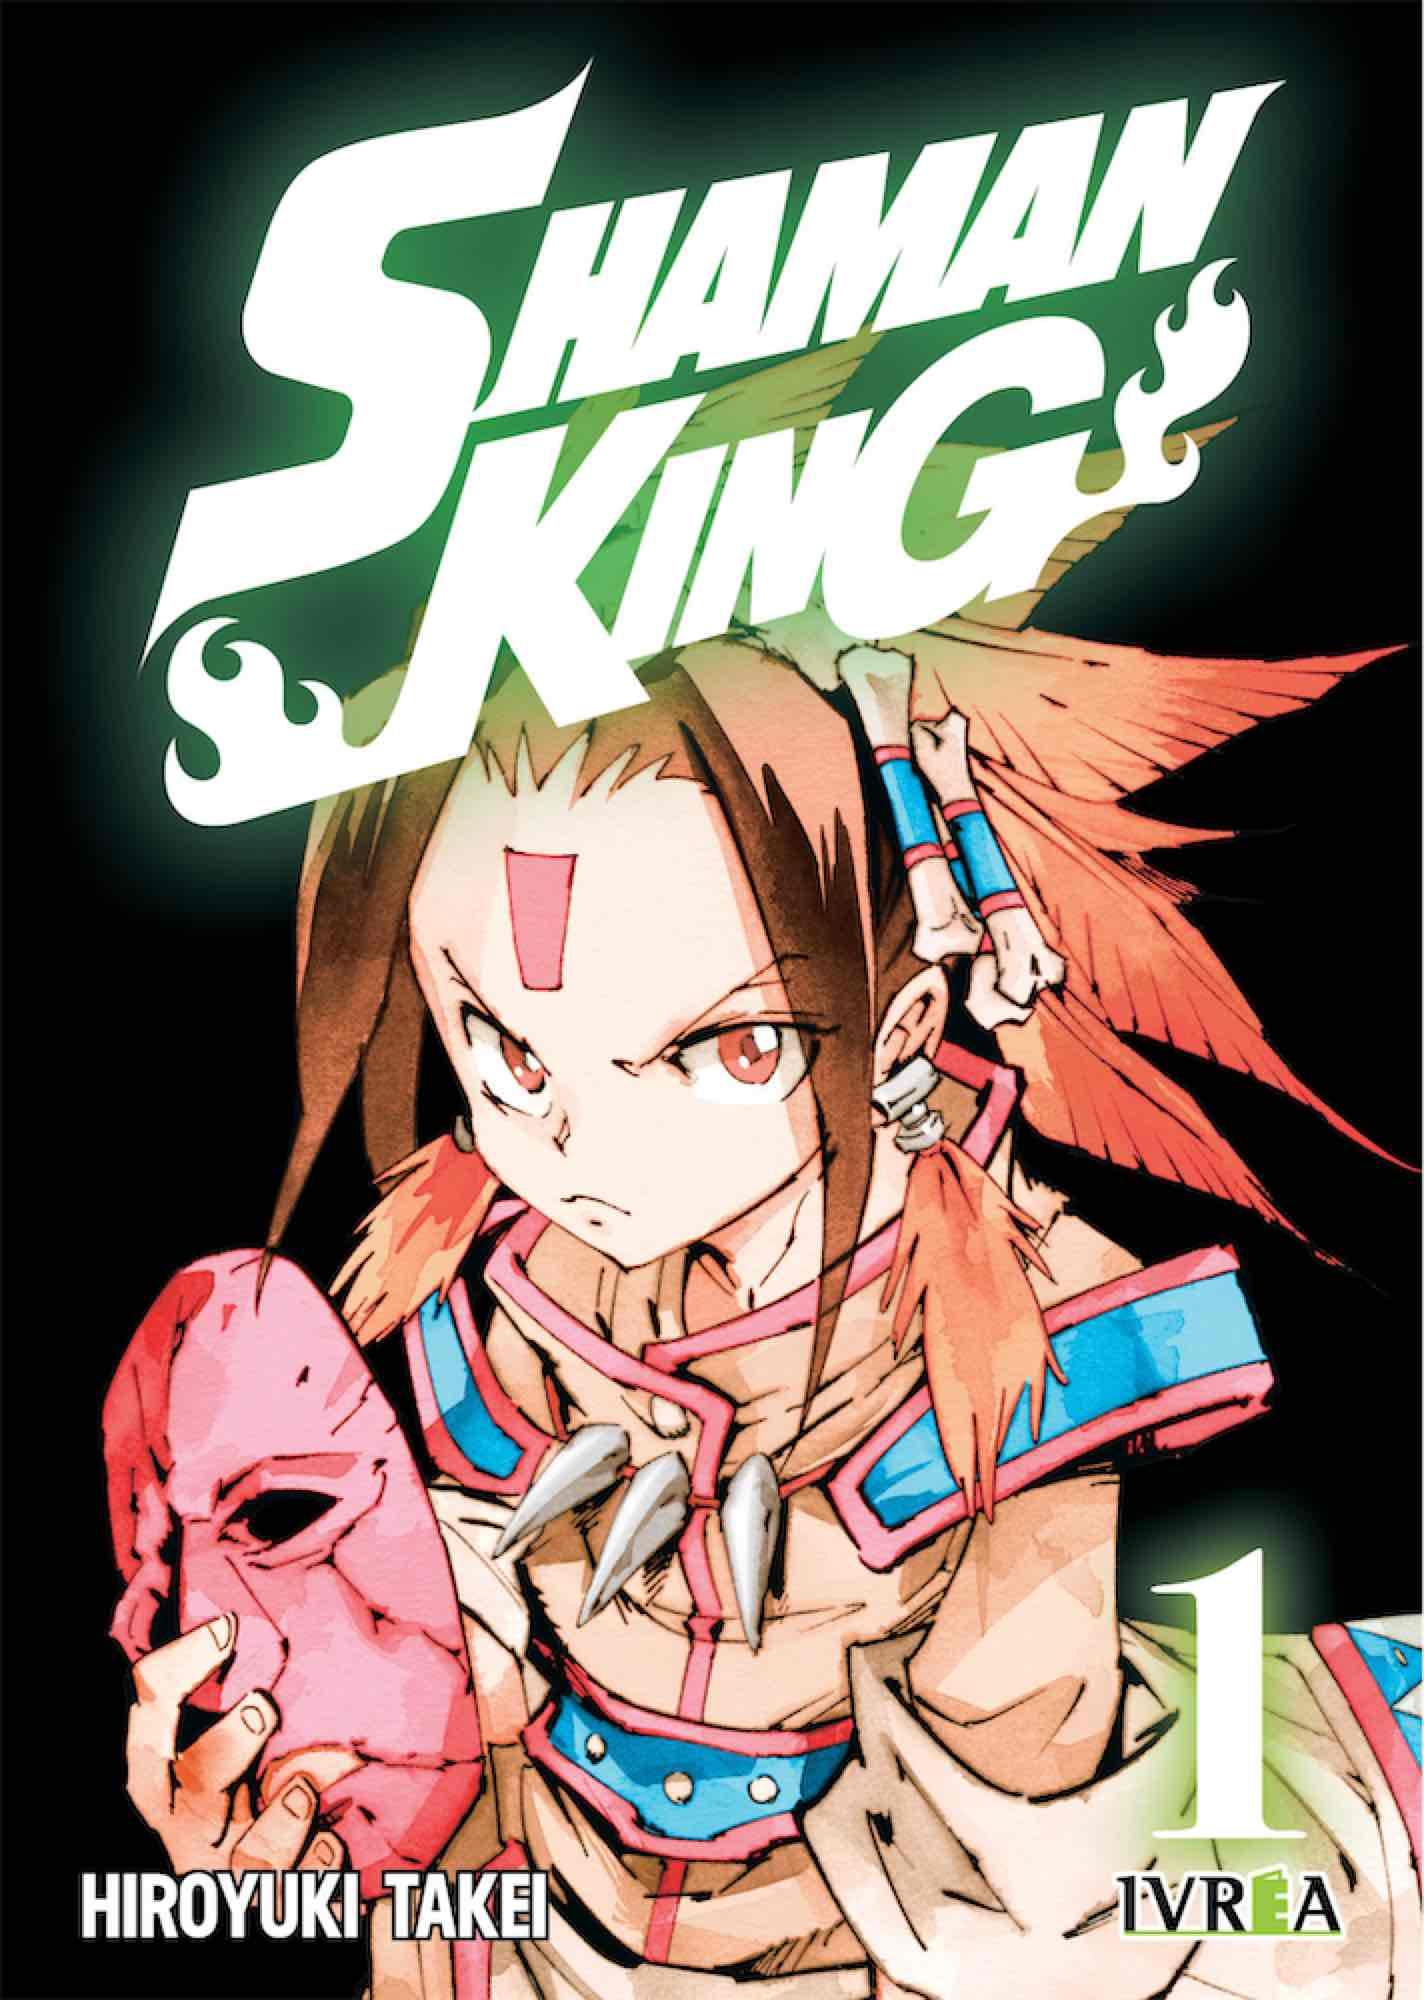 SHAMAN KING 01